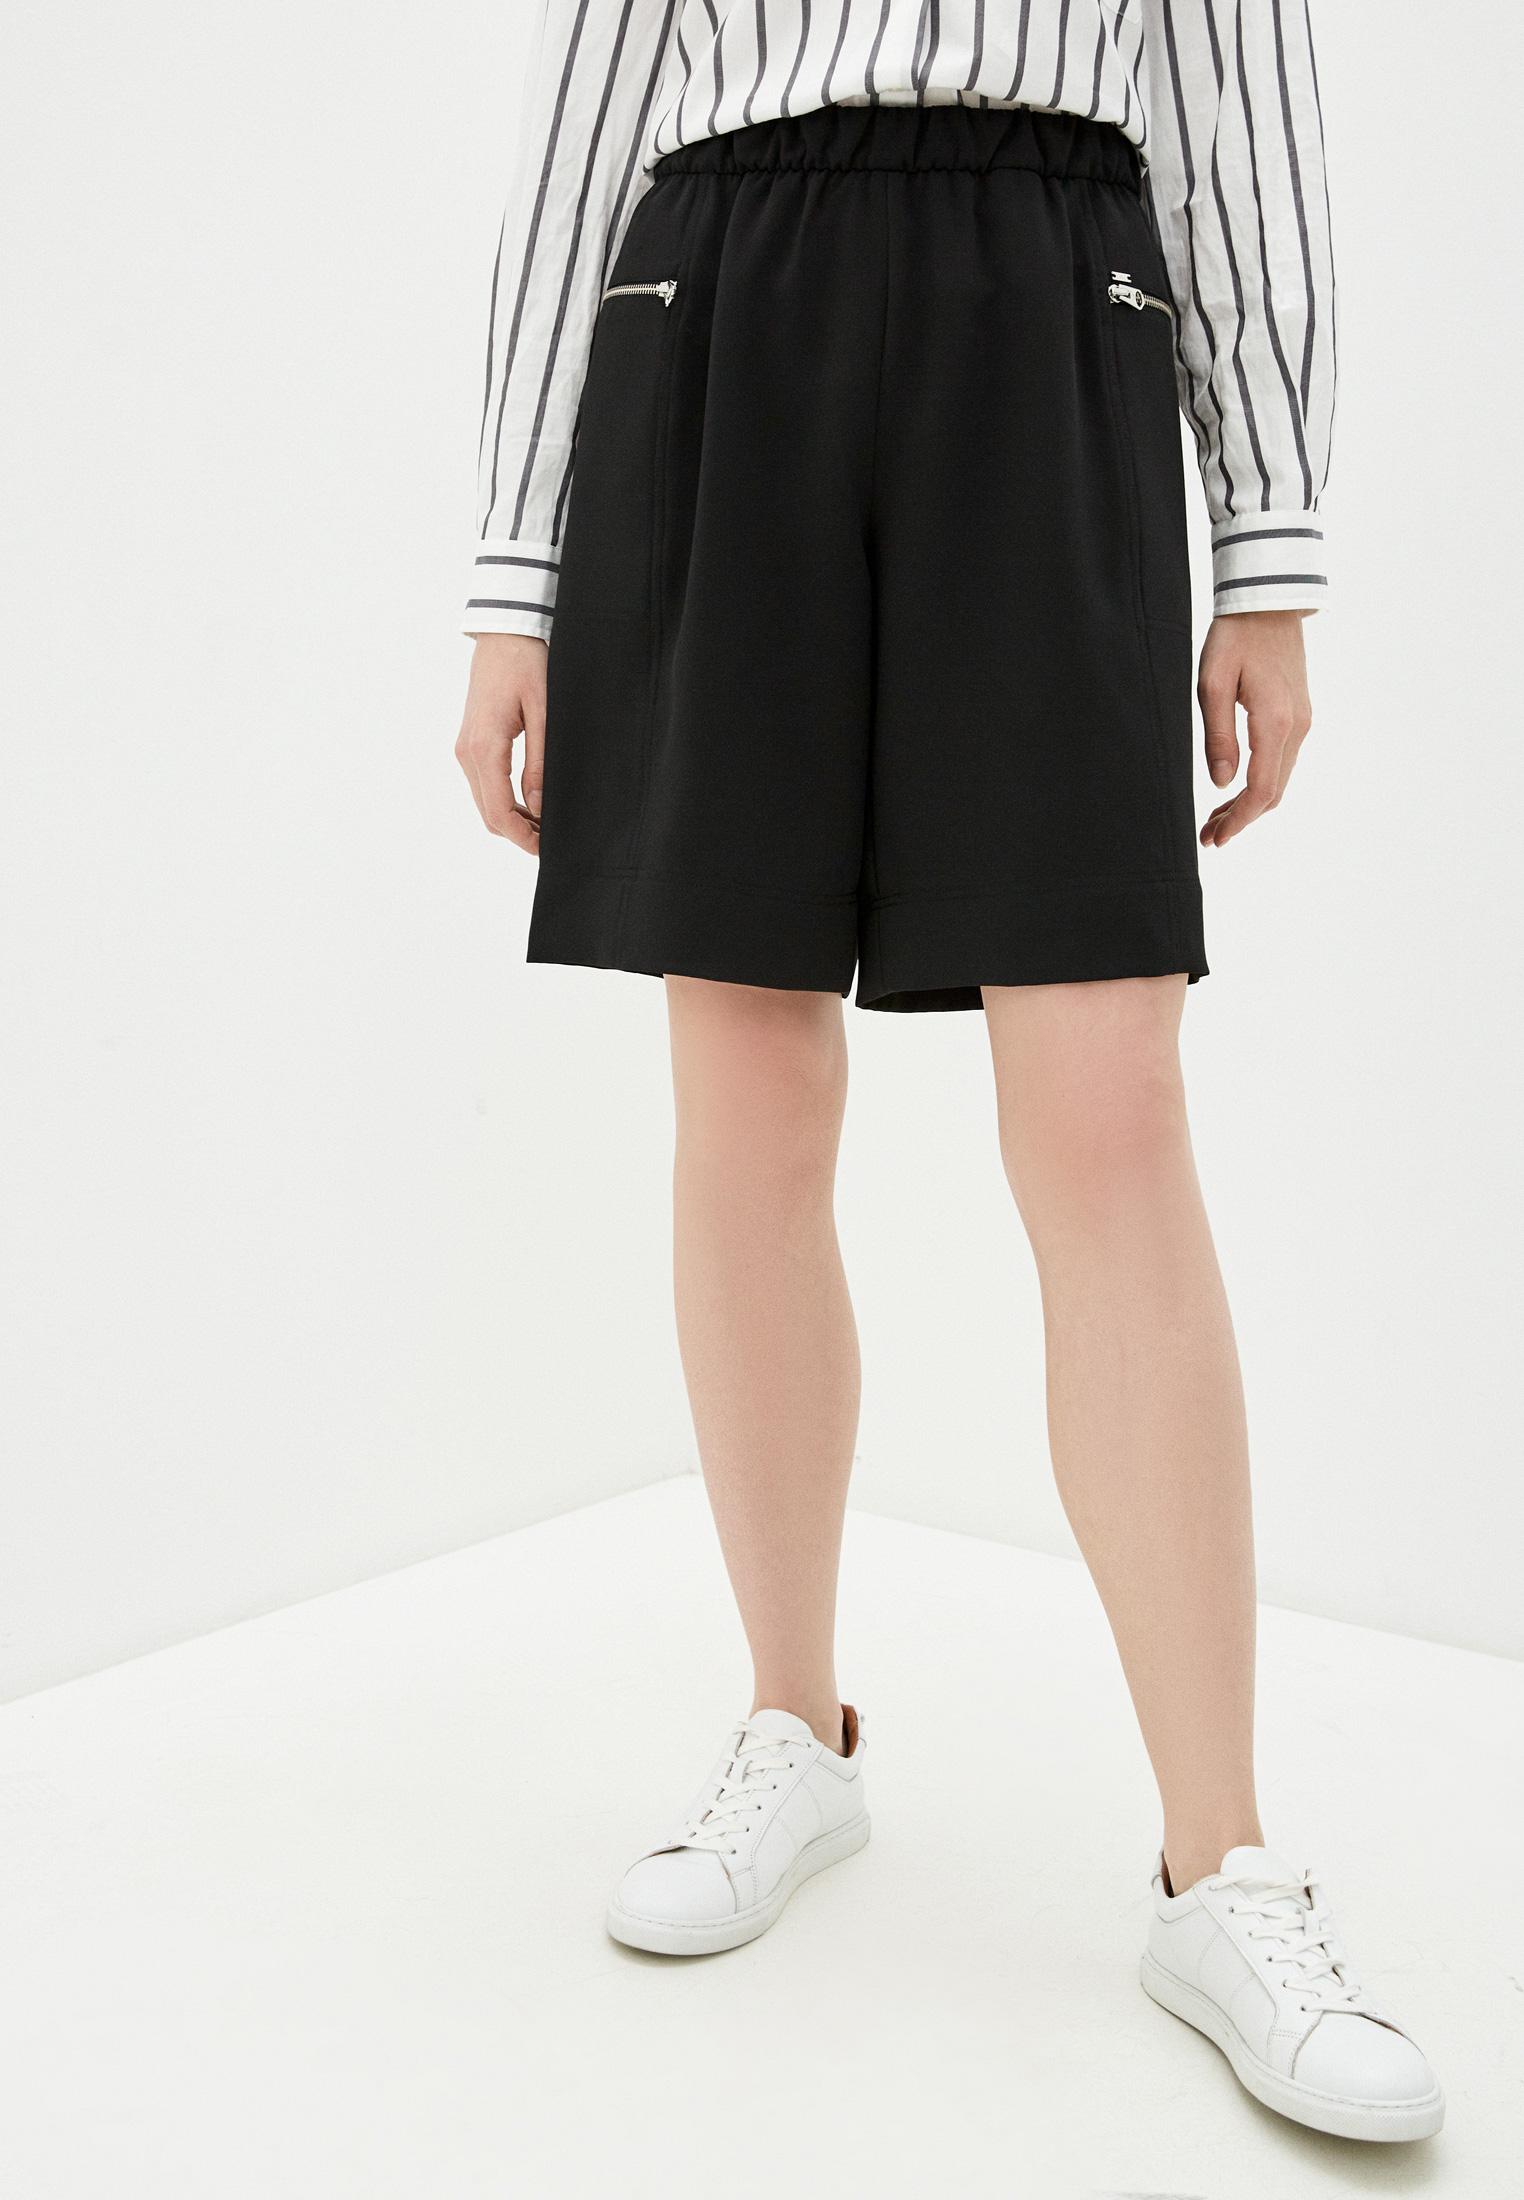 Женские повседневные шорты Calvin Klein (Кельвин Кляйн) K20k201771